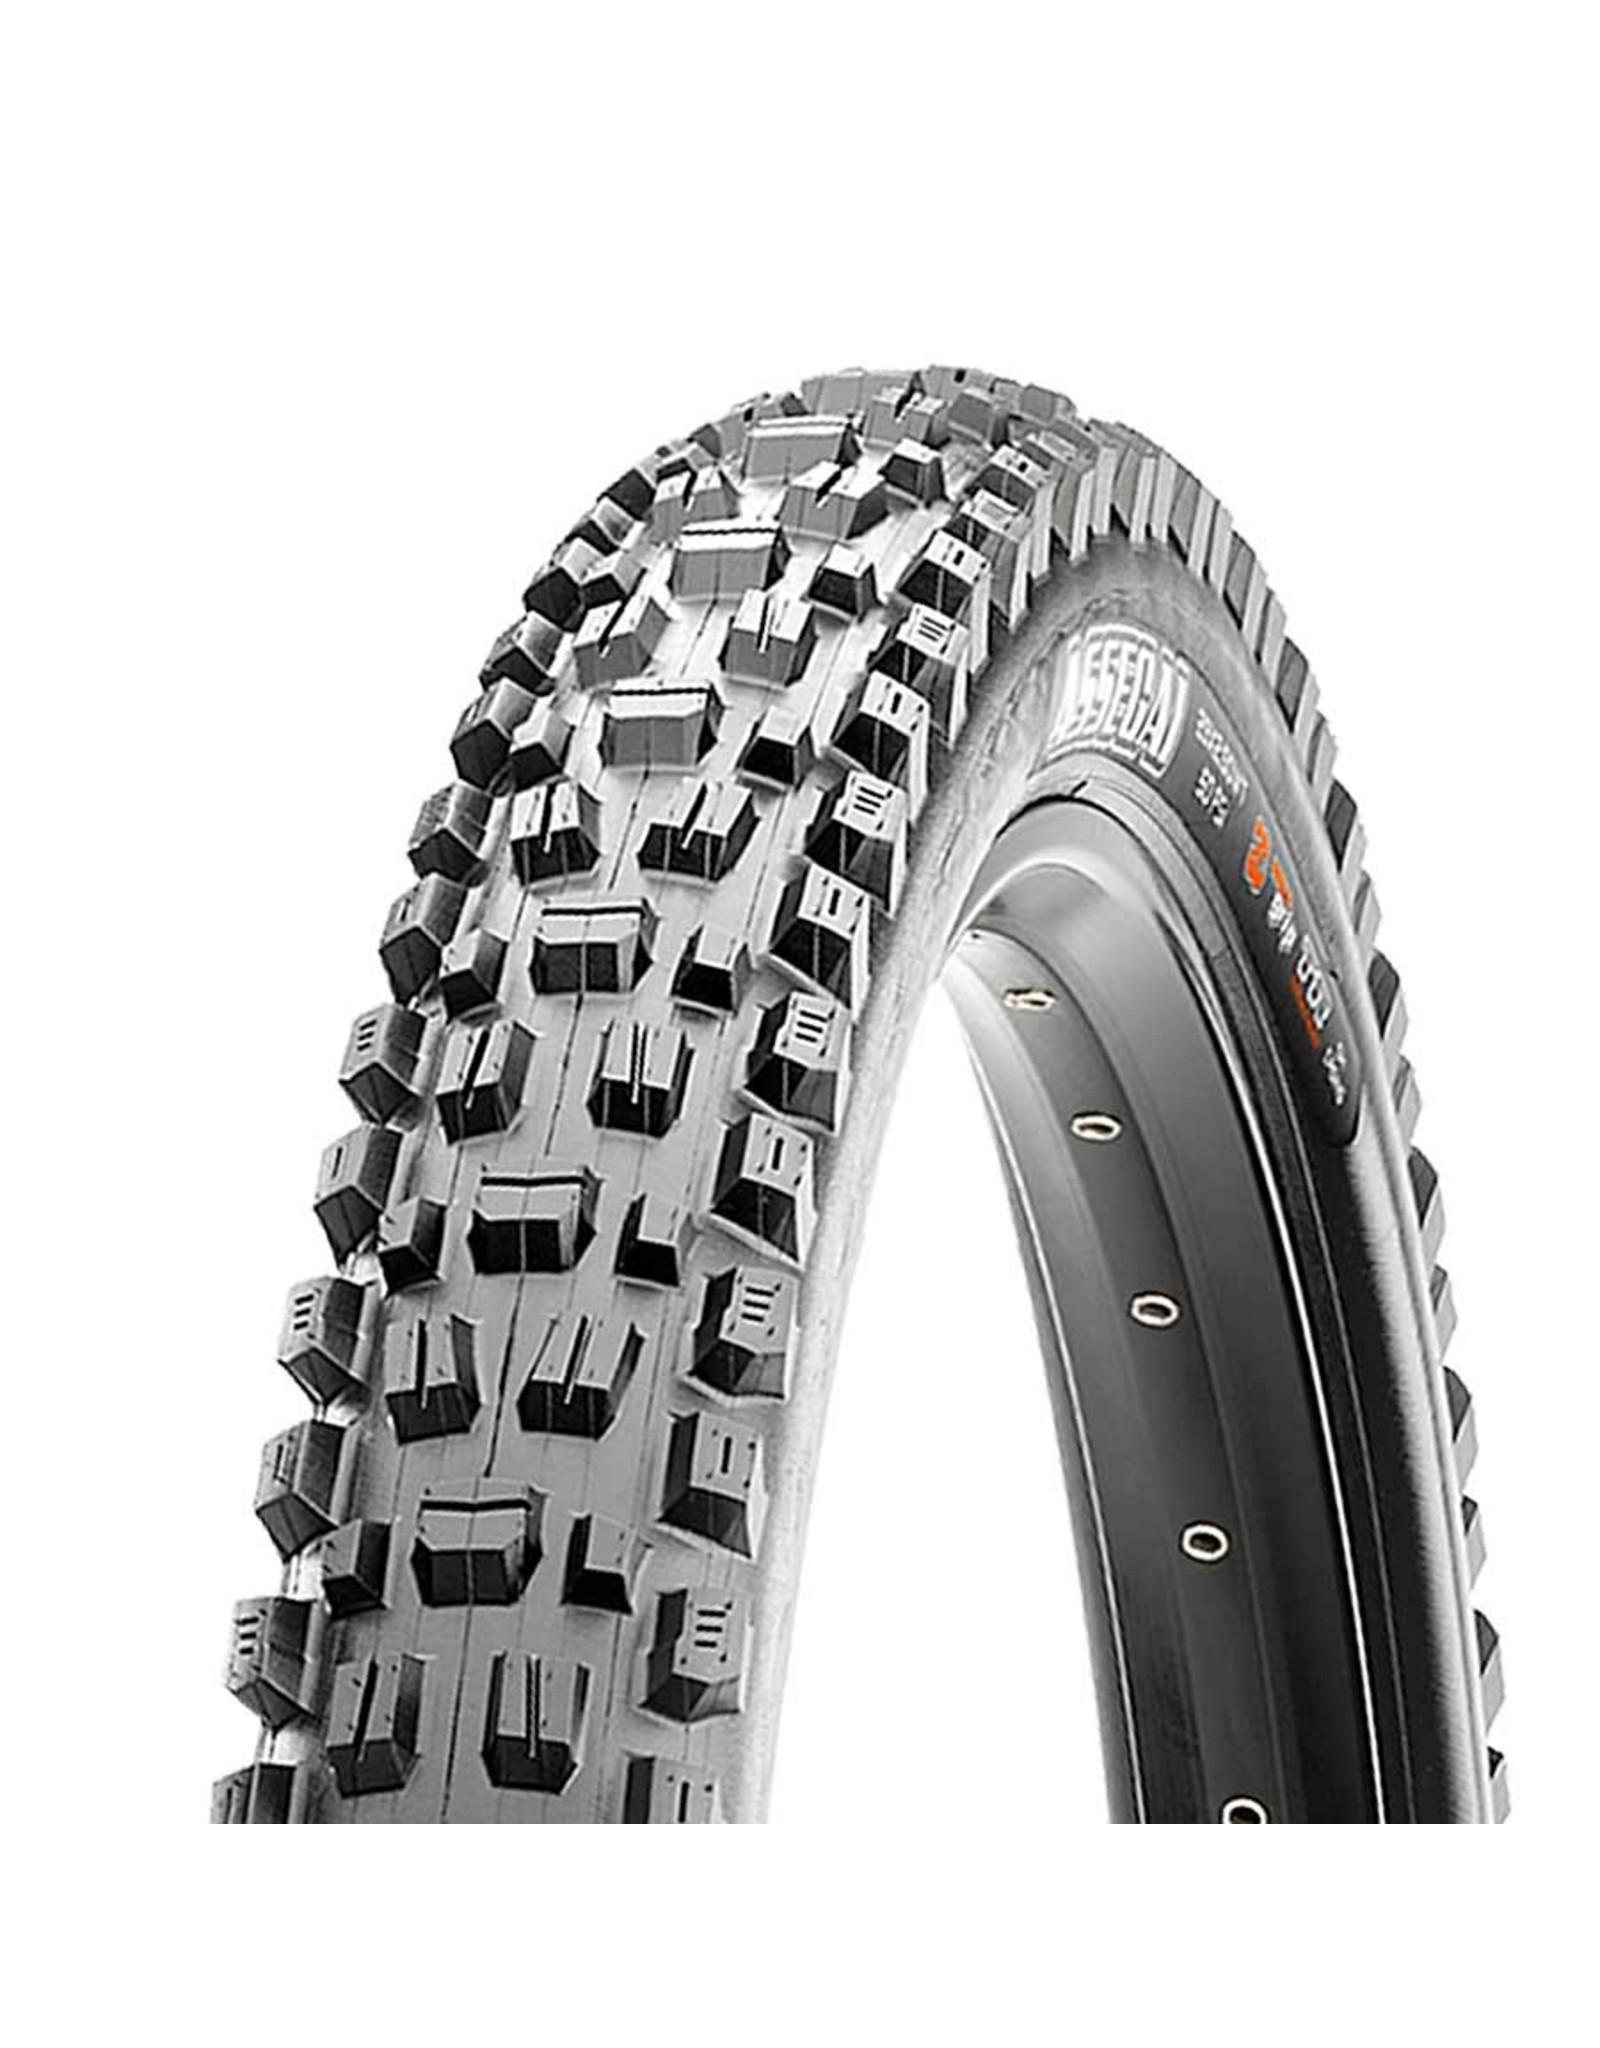 Maxxis Maxxis, Assegai, Tire, 27.5''x2.50, Folding, Tubeless Ready, Dual, EXO, Wide Trail, 60TPI, Black